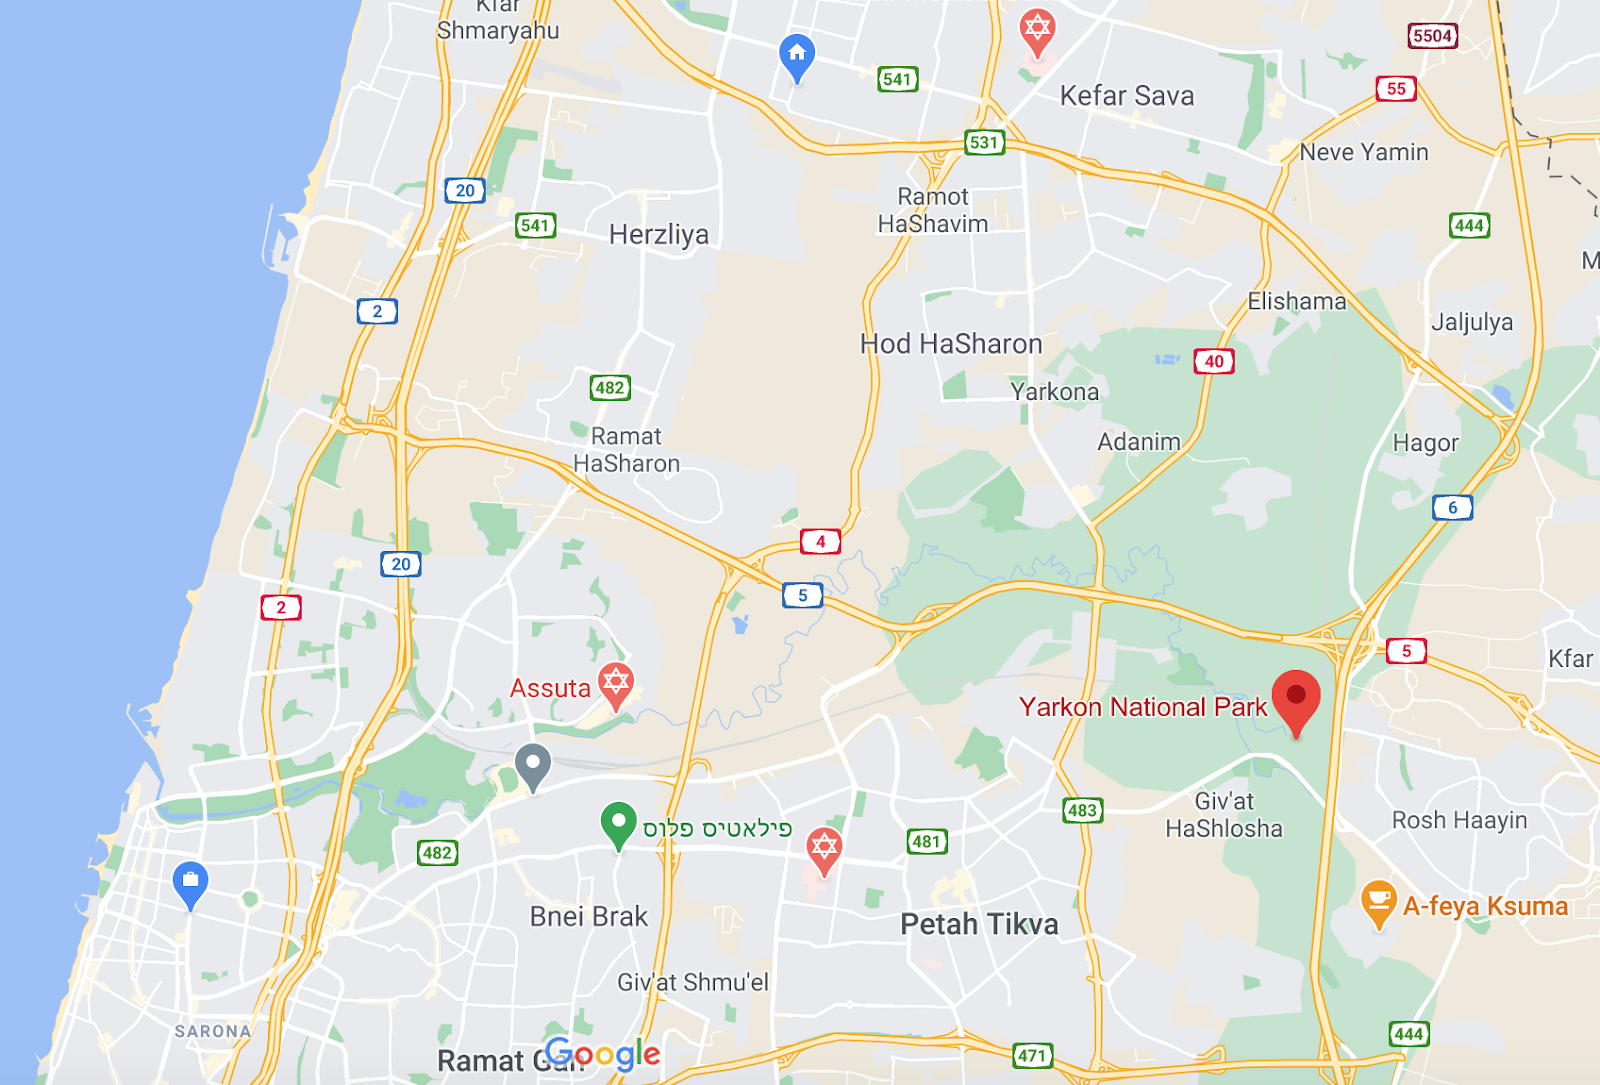 Map to arrive at Yarkon National Park